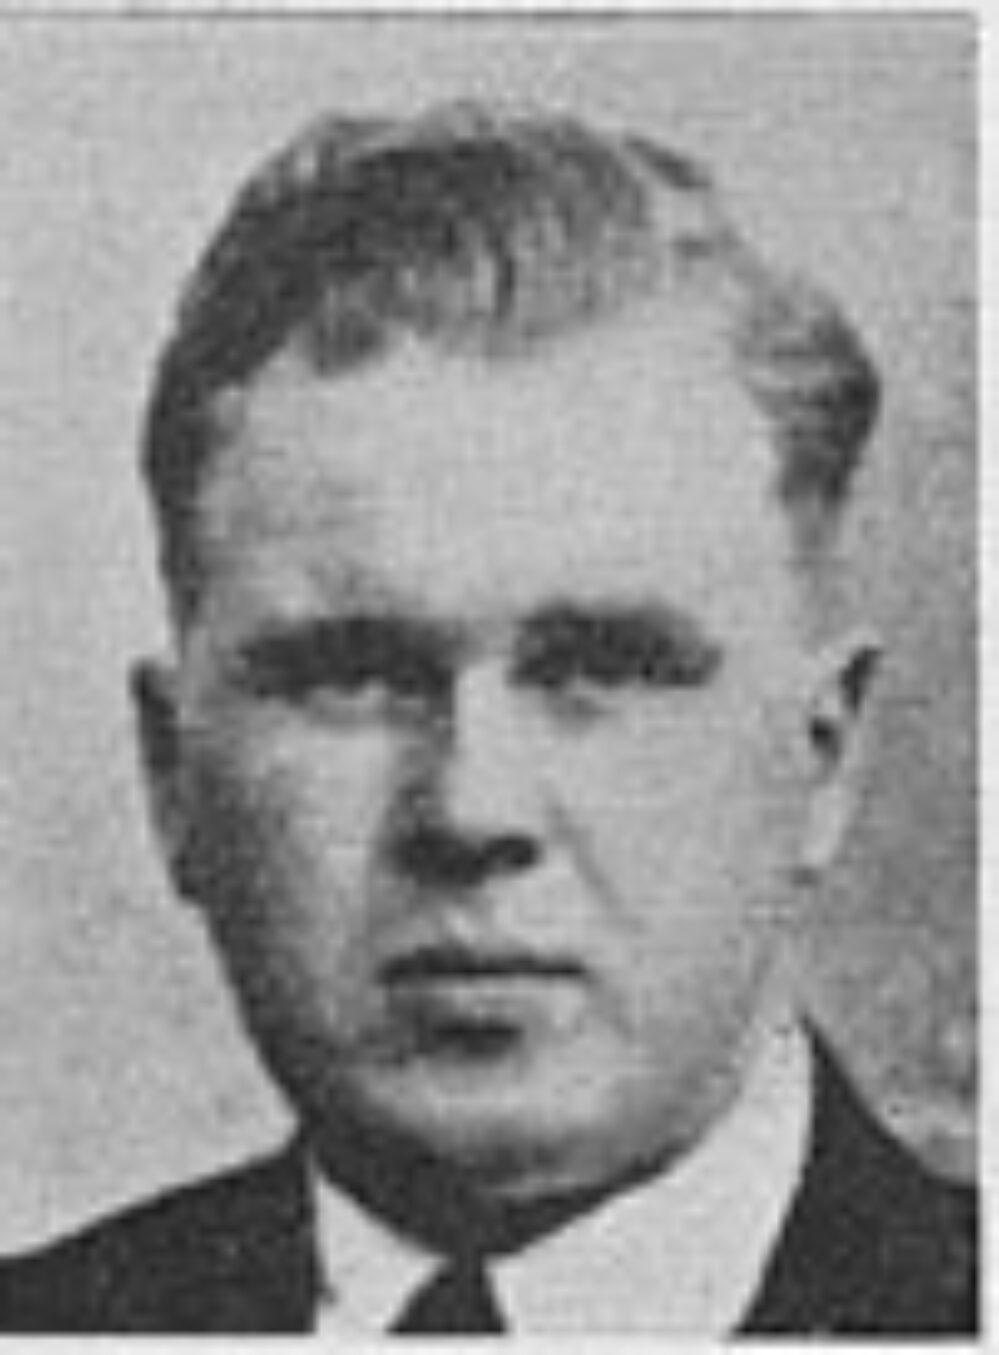 Hans Adolf Nilsen